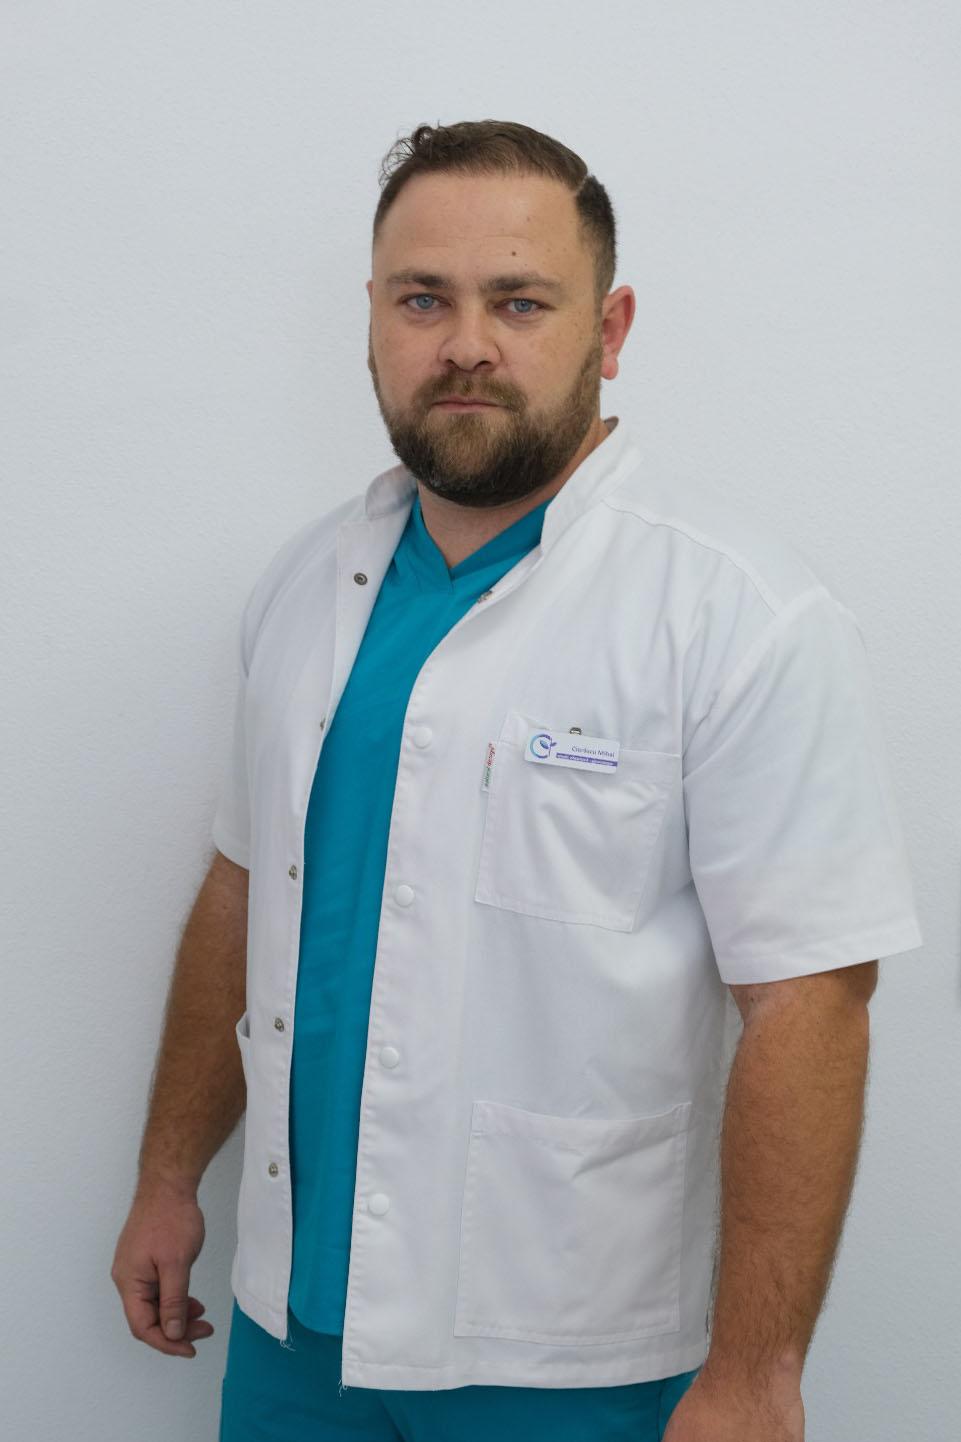 Dr. Mihai Ciorascu 02b